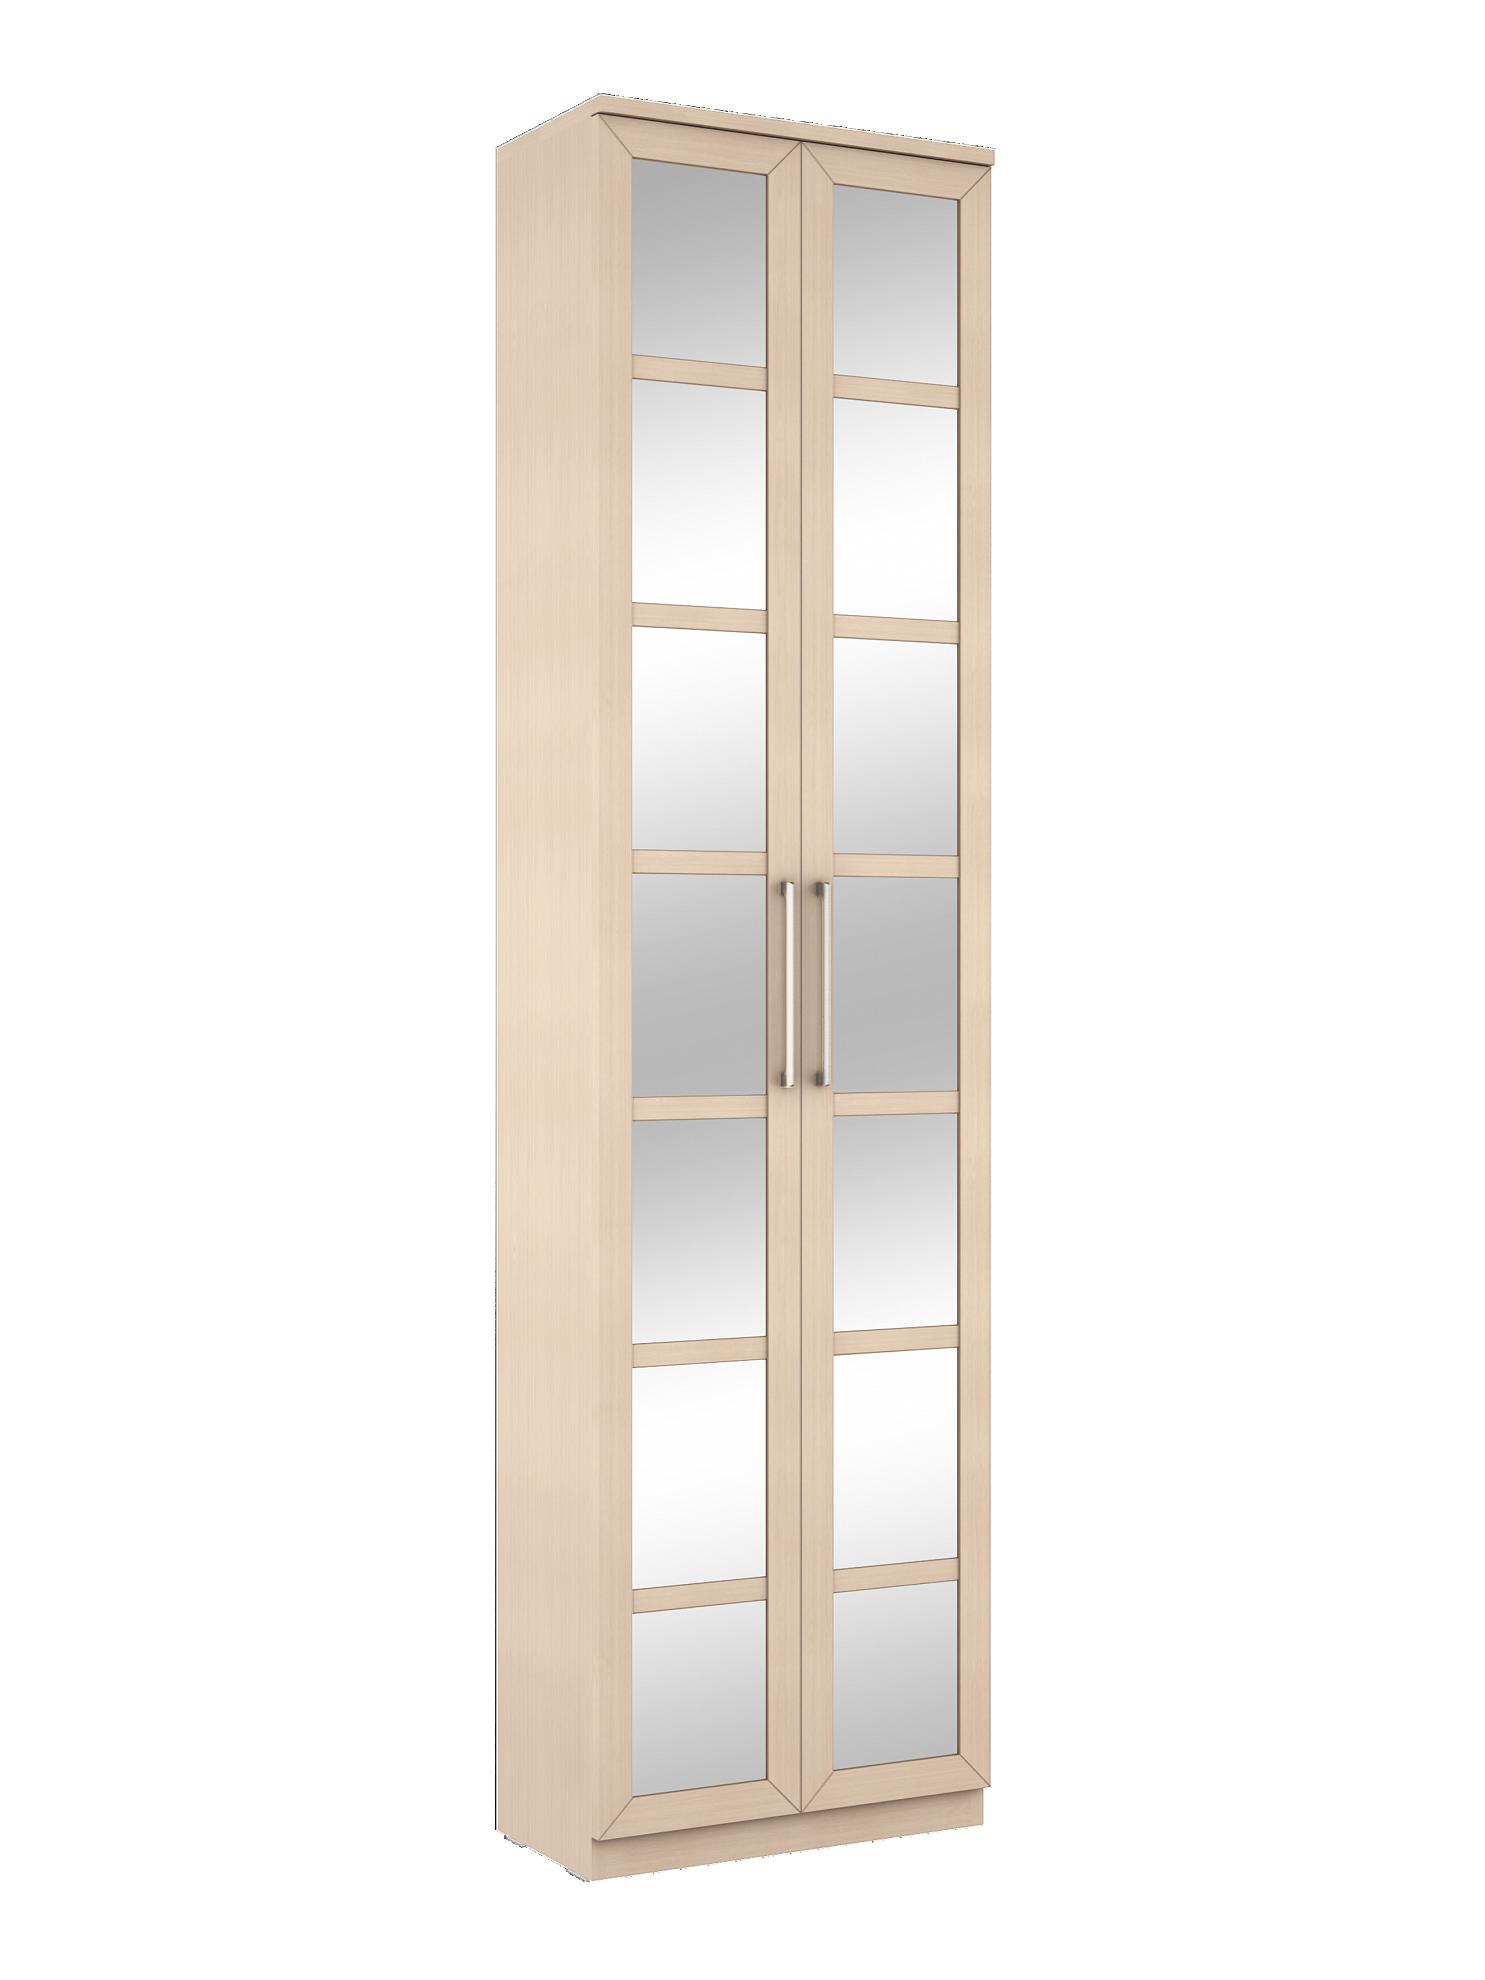 Соло 058 Шкаф платяной фасады зеркало Дуб Молочный